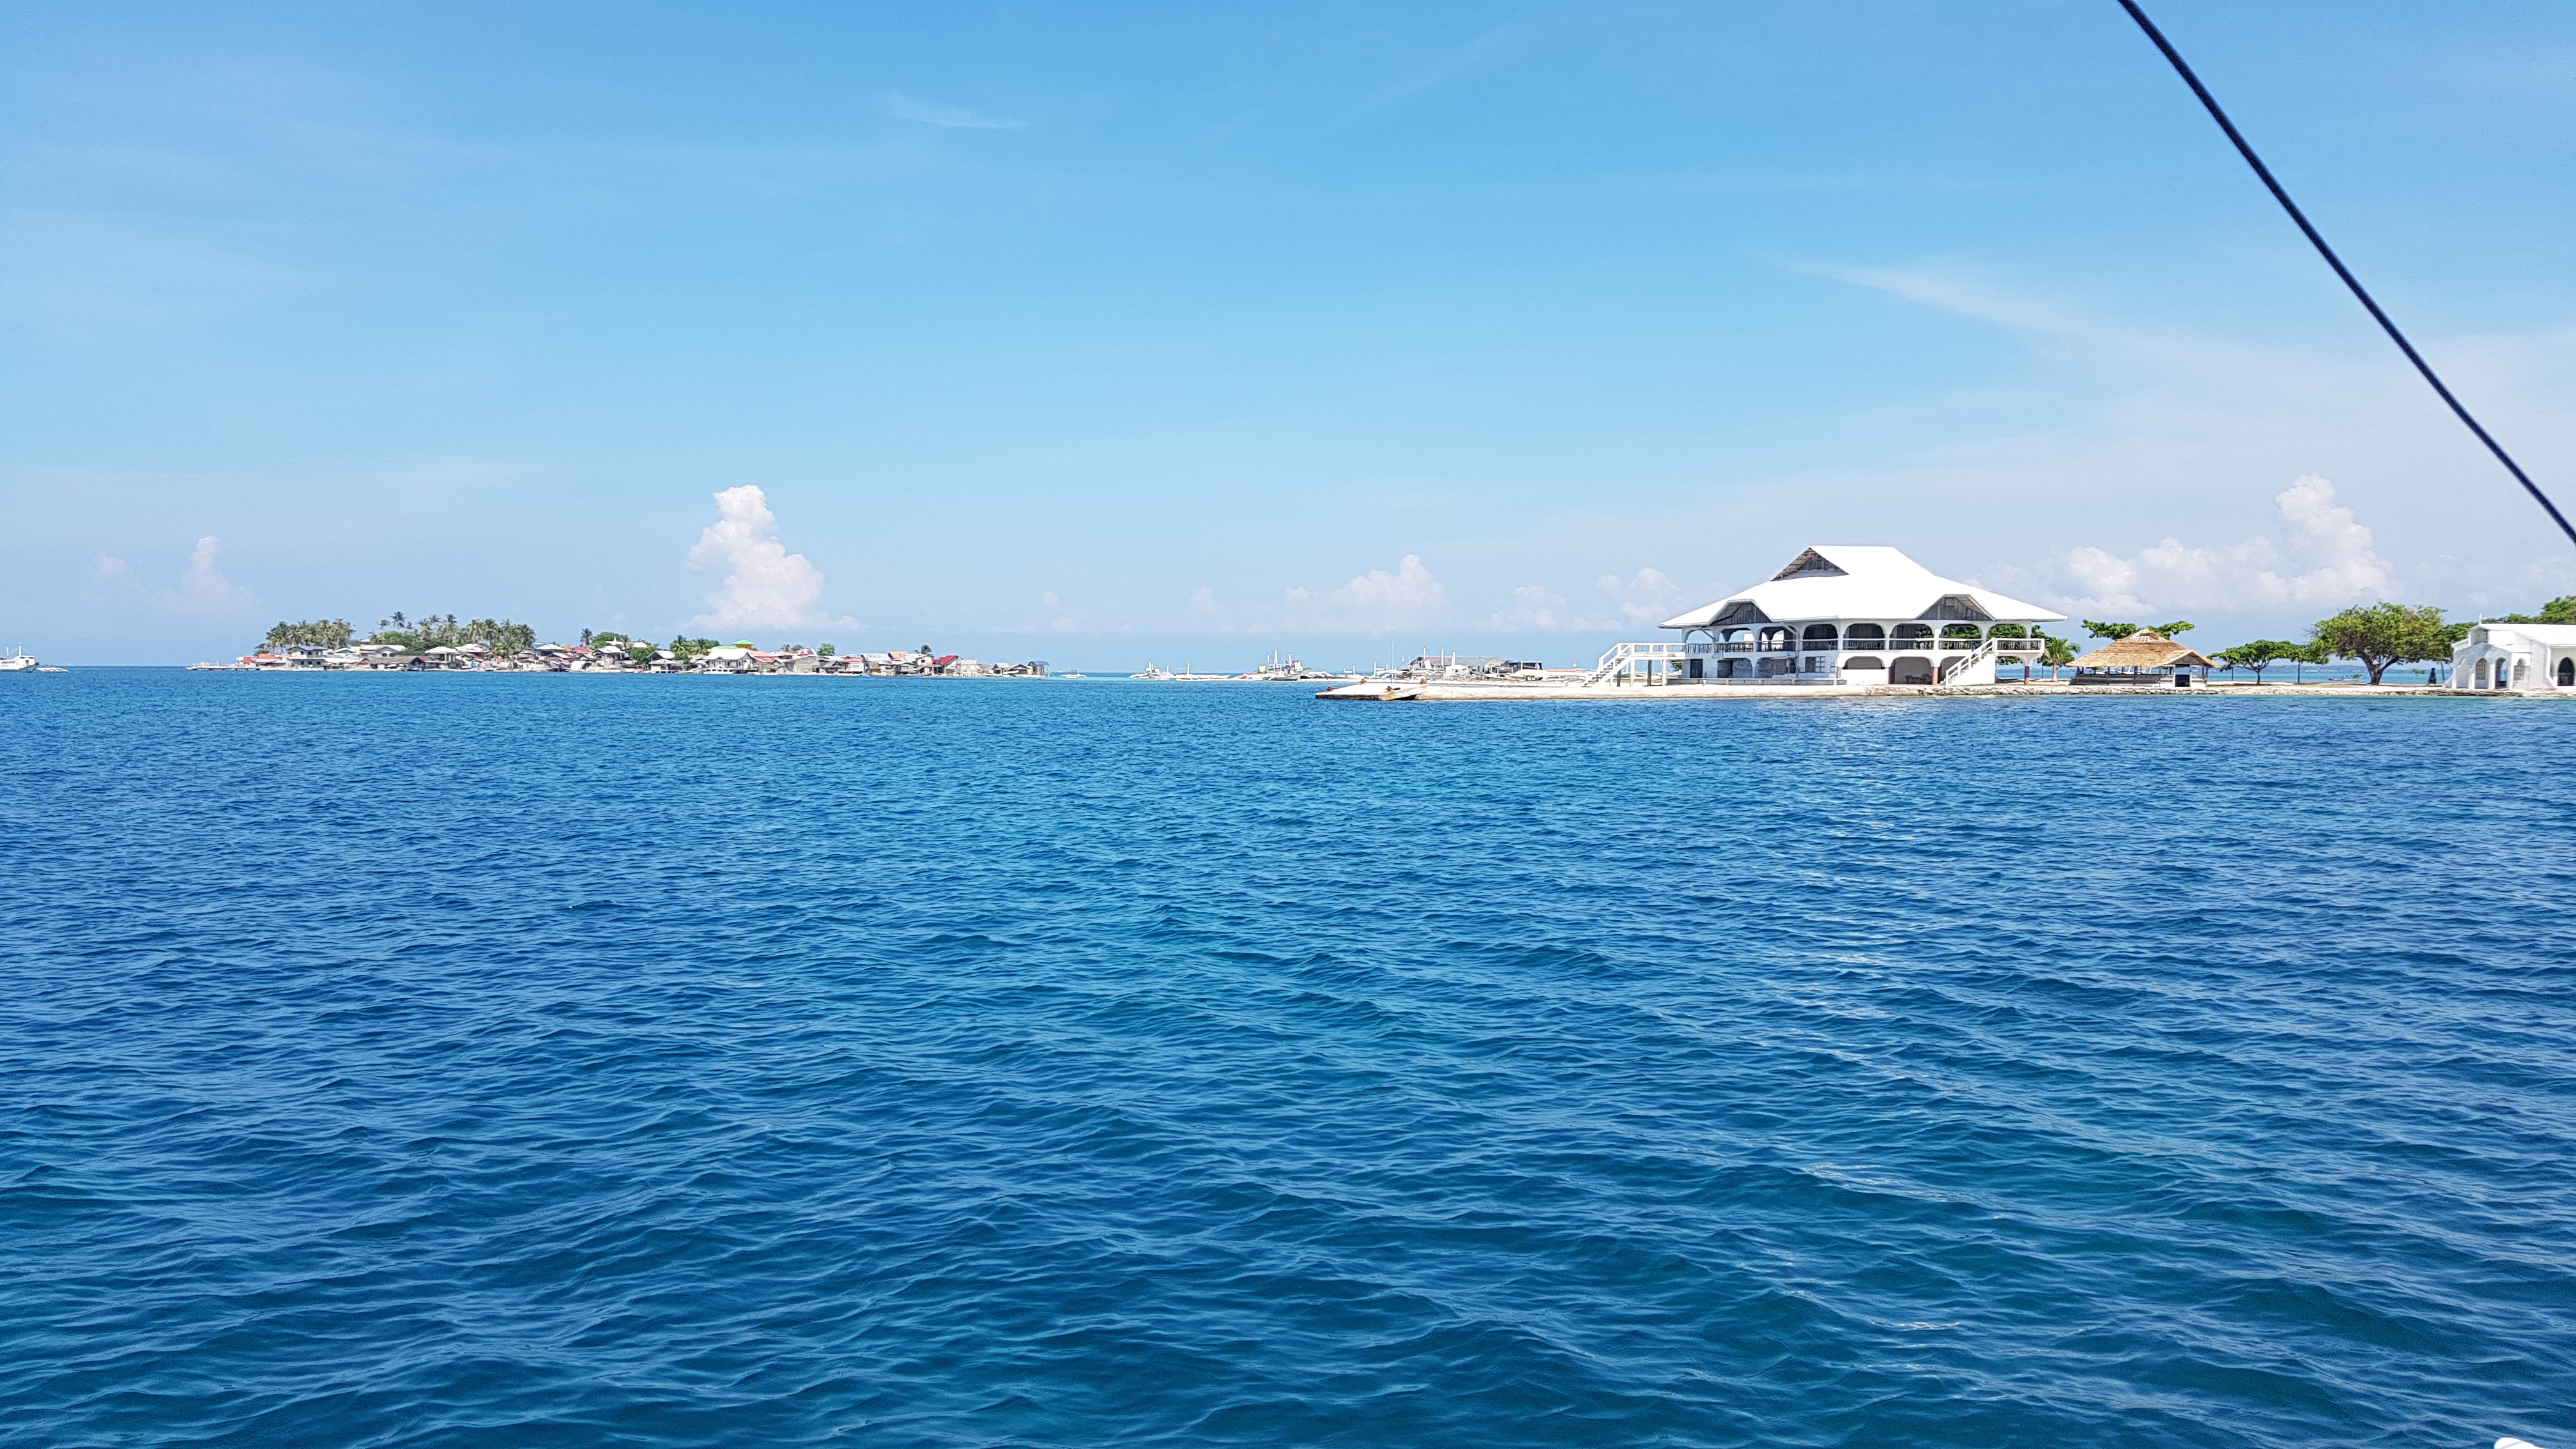 Approaching an island